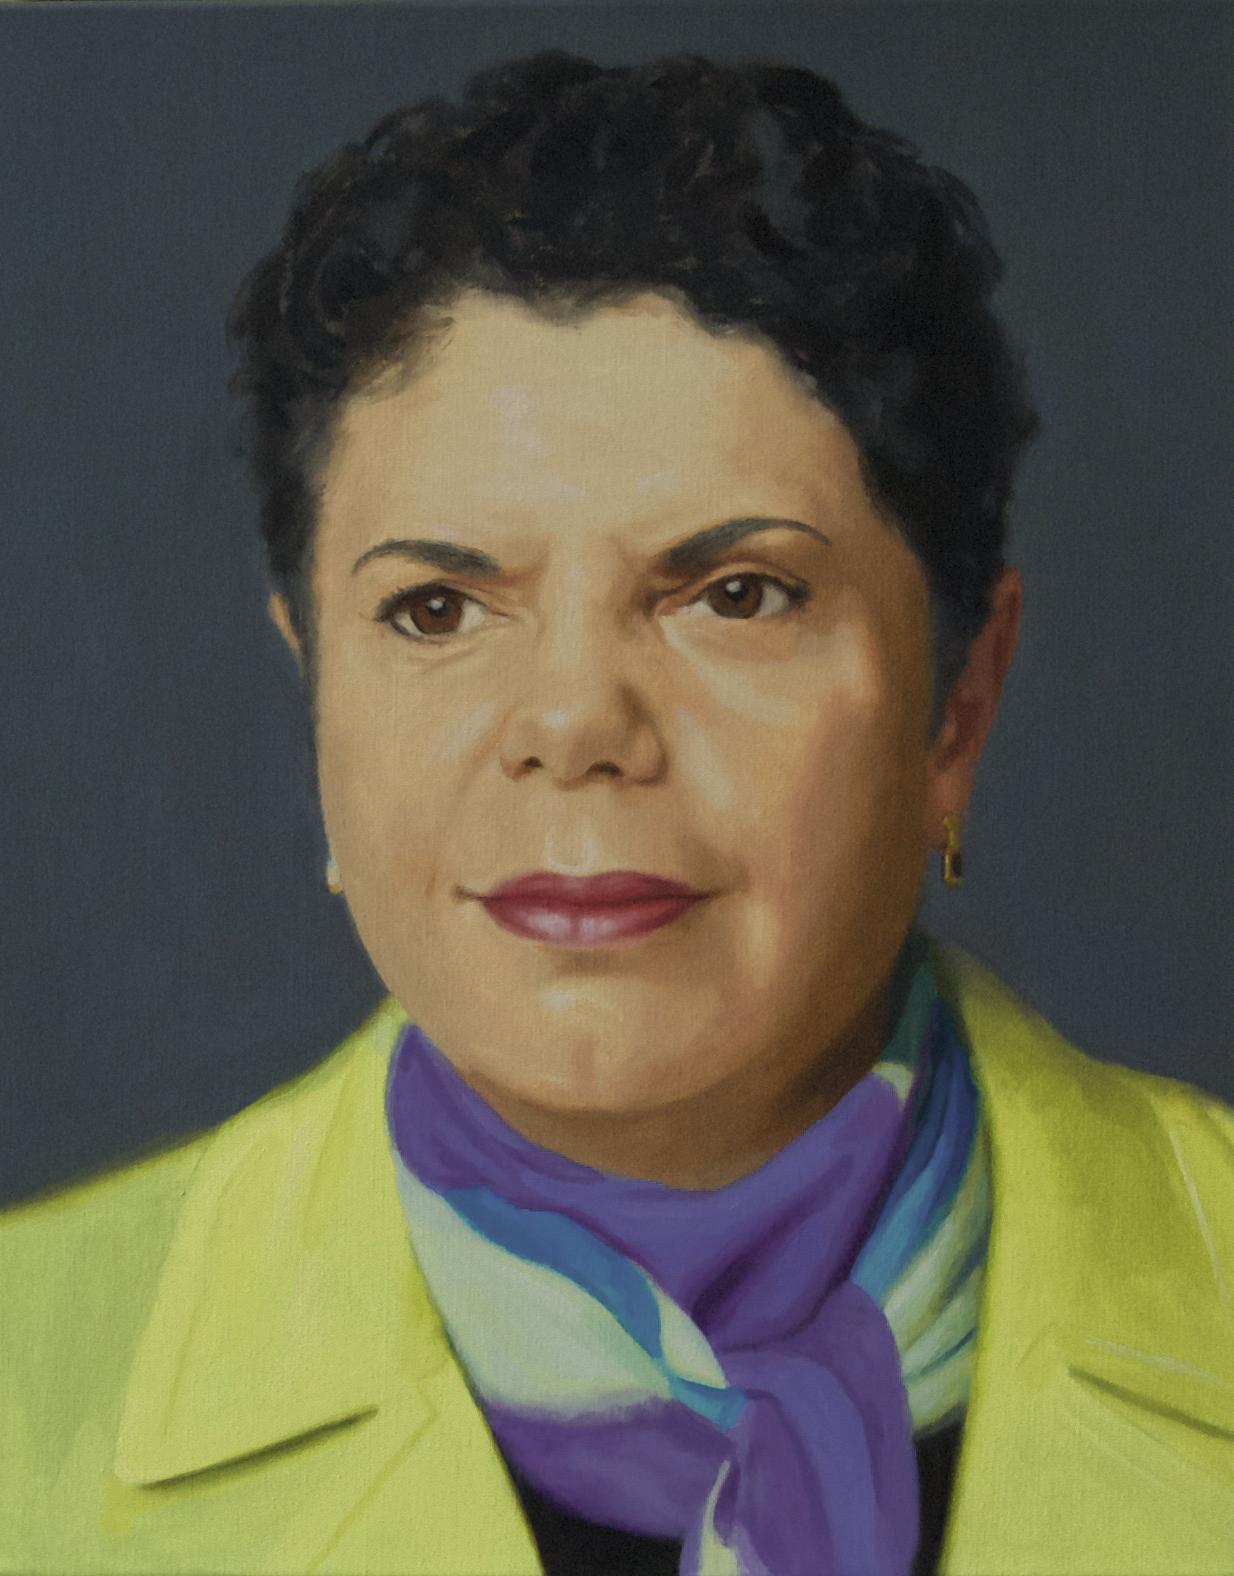 Richard Knafelc  Deborah Cheetham  2015 oil on linen 51 x 41 cm